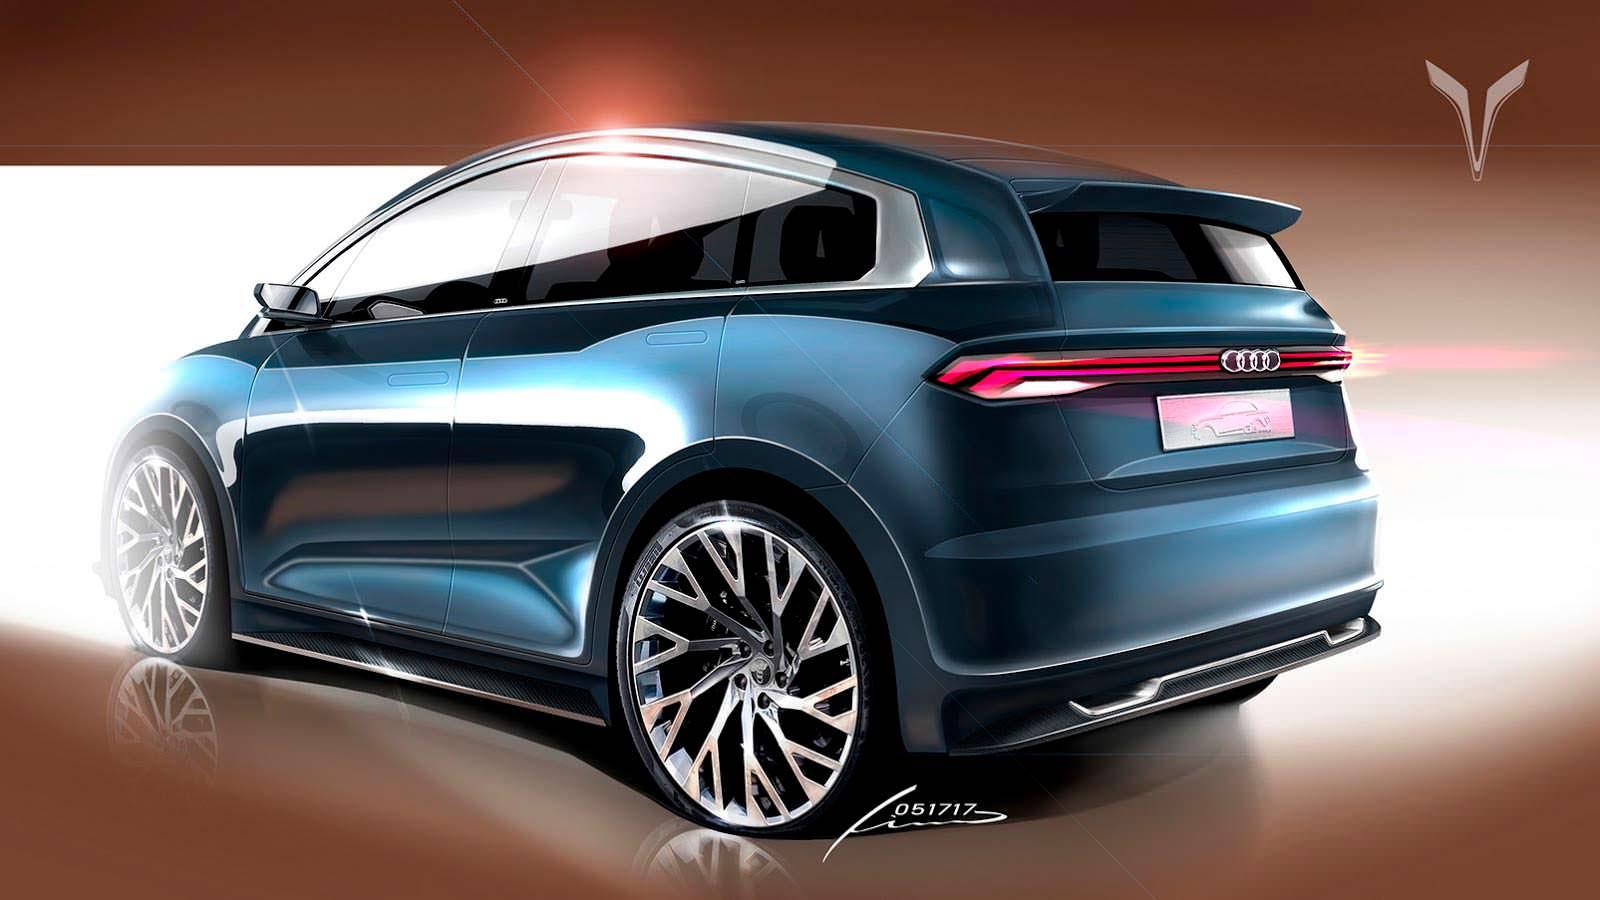 2018 Audi A2 второго поколения. Неофициально от Pino Cazzetta